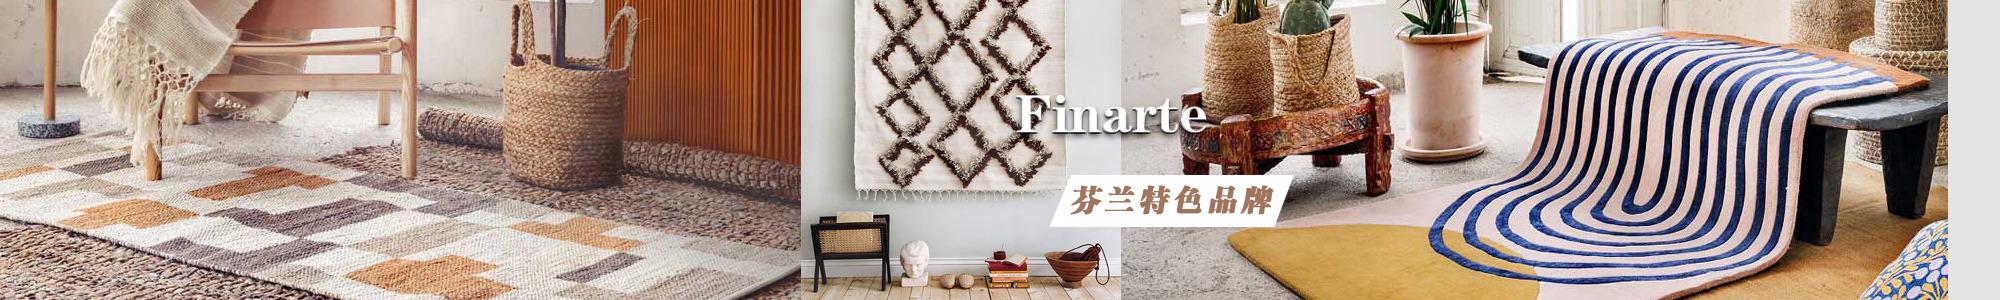 Finarte地毯